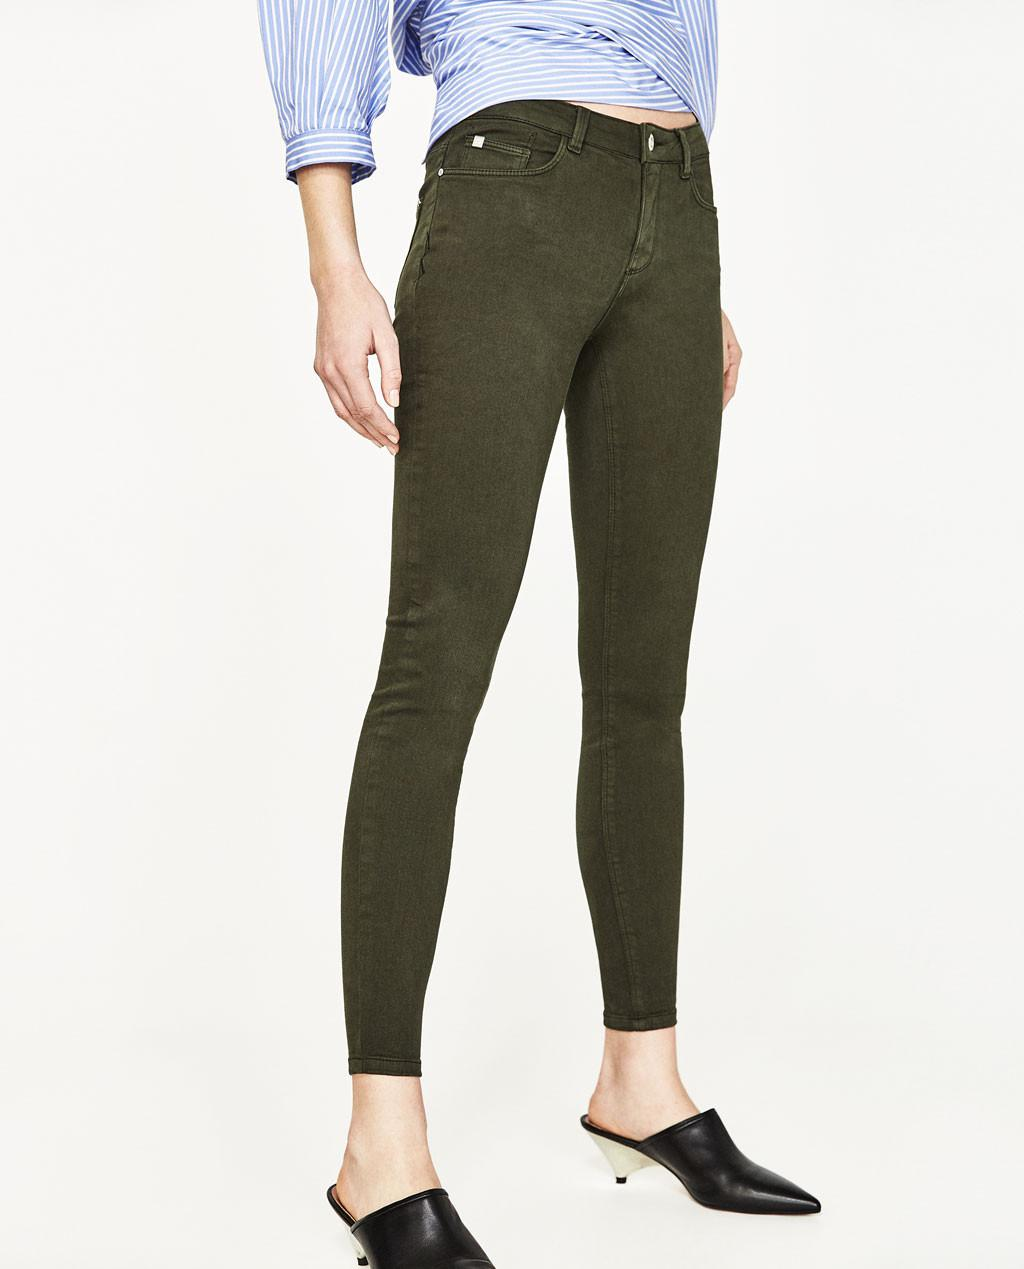 Skinny jeans. (Image: zara.com)